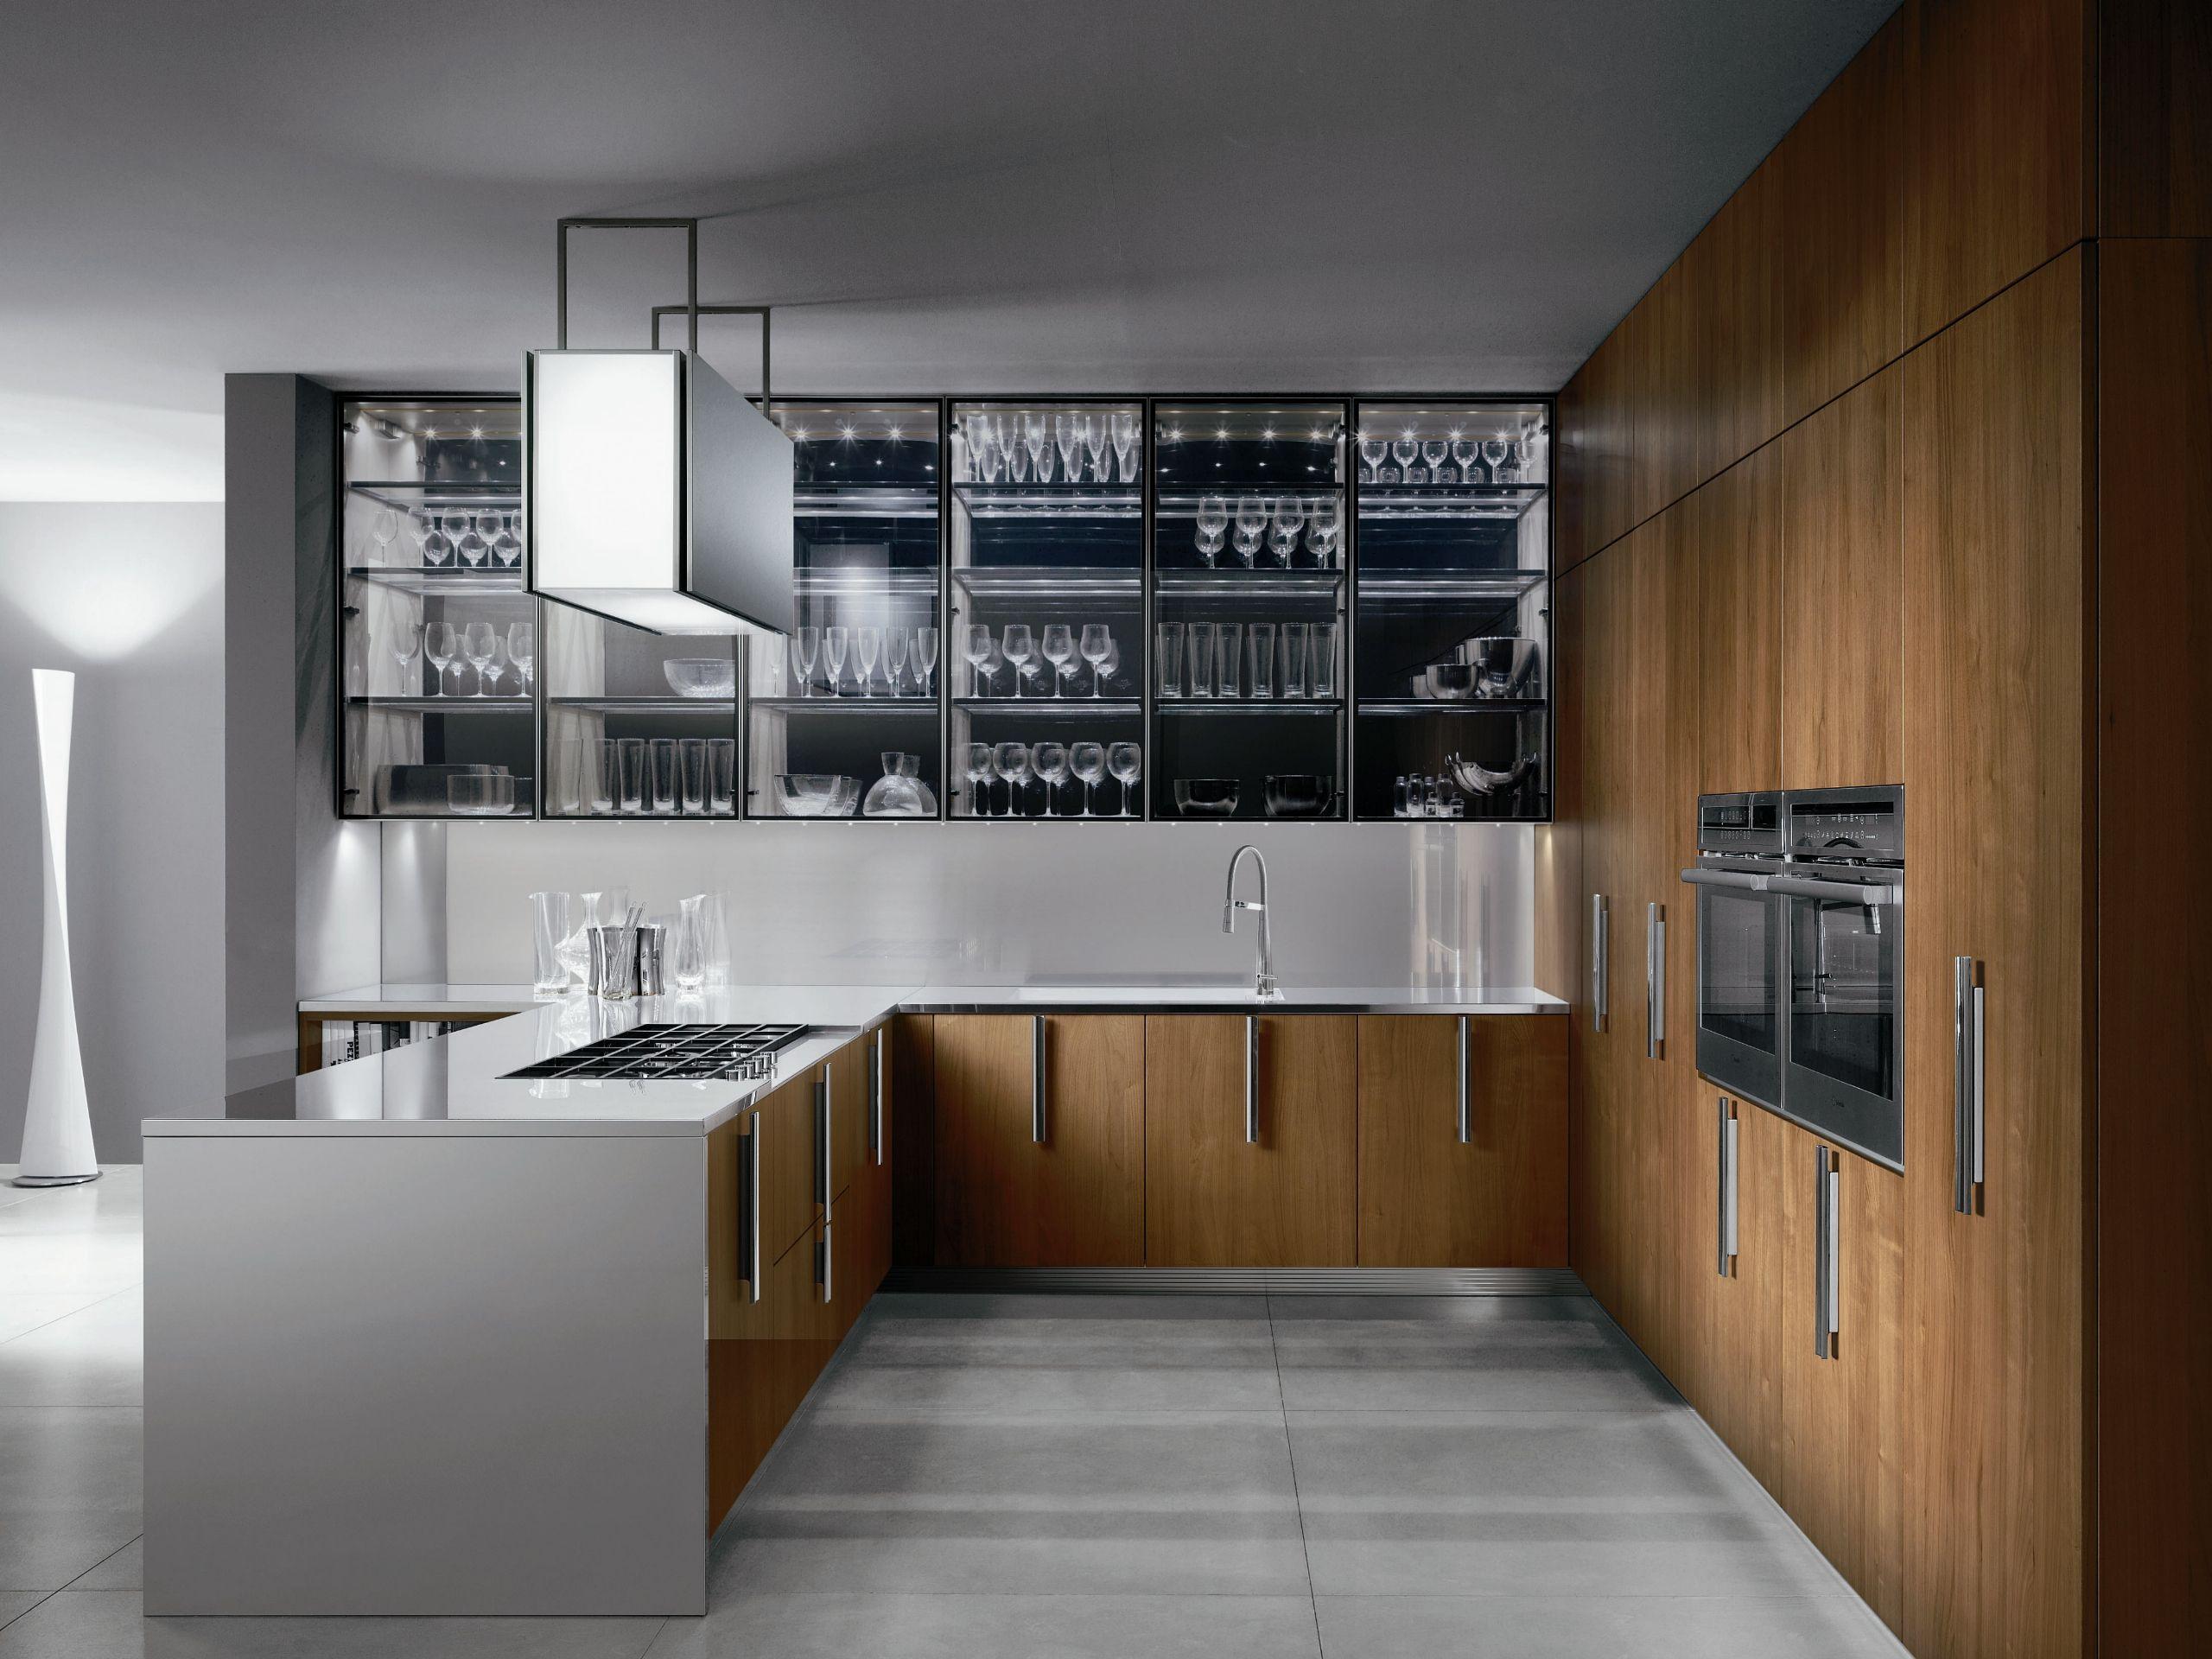 Best Cucine Legno E Acciaio Ideas - Home Design Ideas 2017 ...